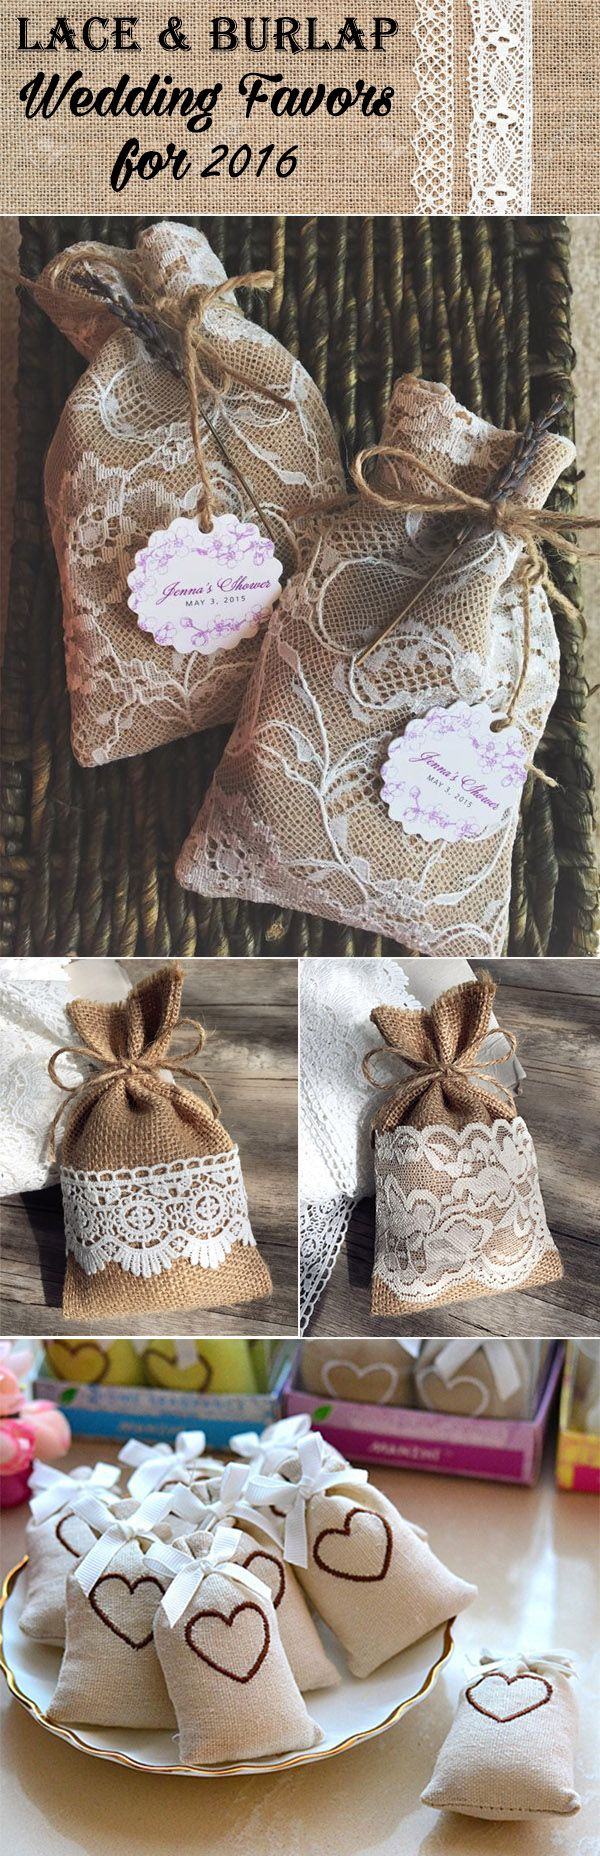 2016 trending lace and burlap wedding favor ideas